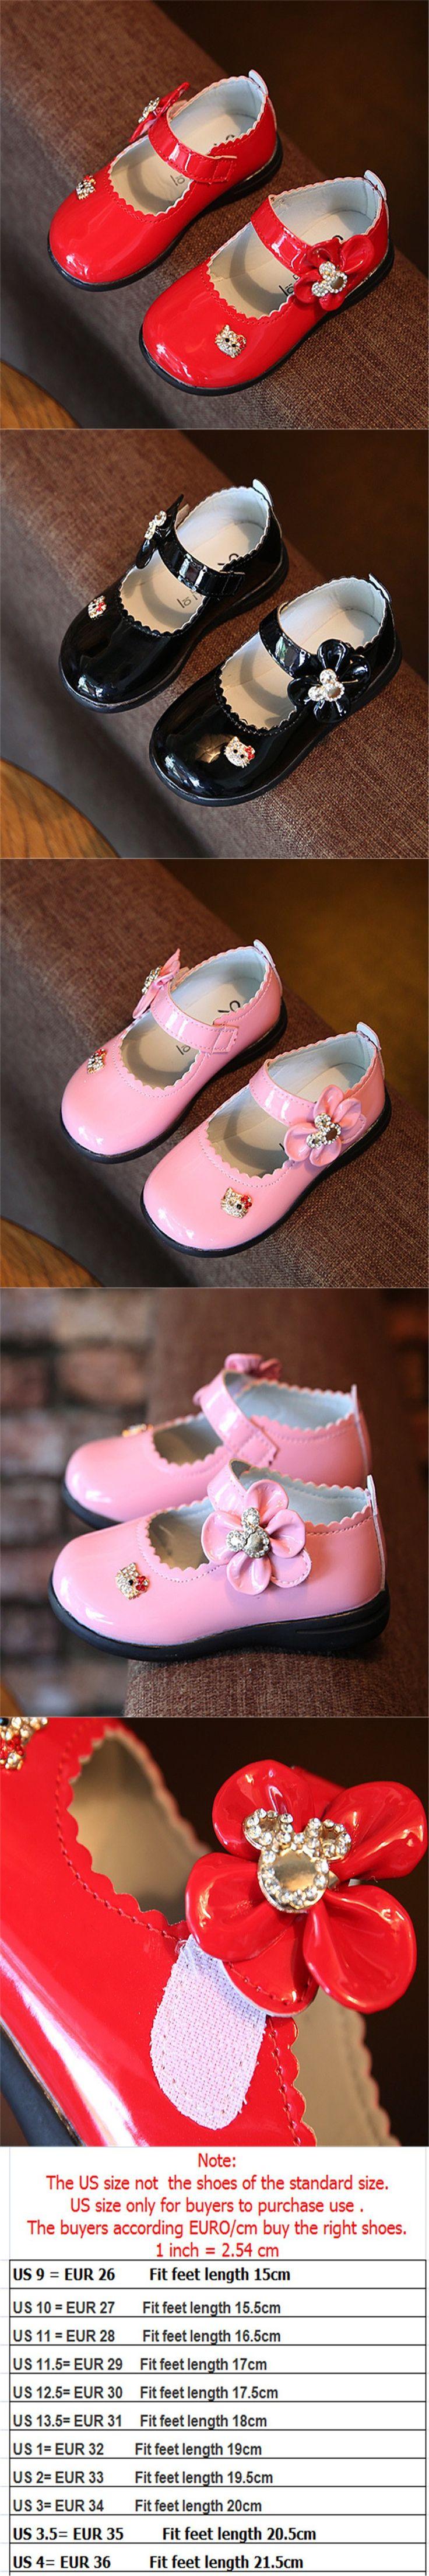 Kids Shoes For Girls 2016 Single Flats Designer Children Leather Flower Girls Shoes Princess chaussure enfant fille 26-36 $14